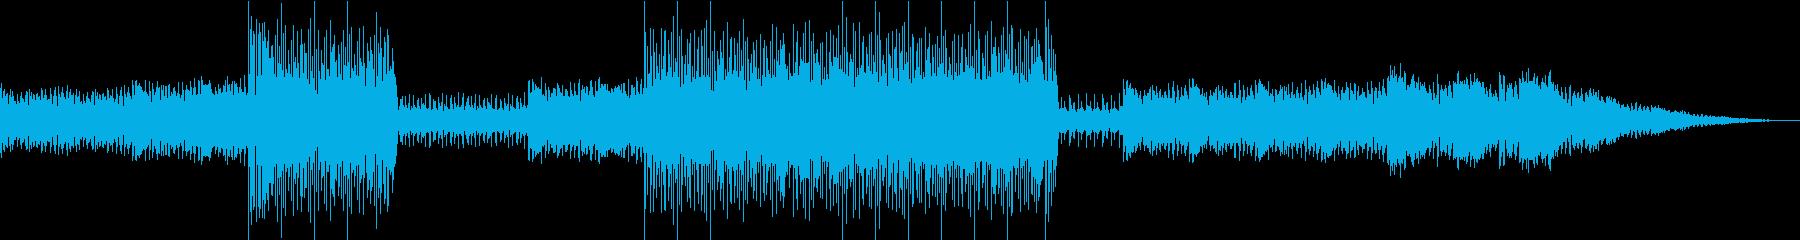 70s風ロック・軽快・希望・出発の再生済みの波形